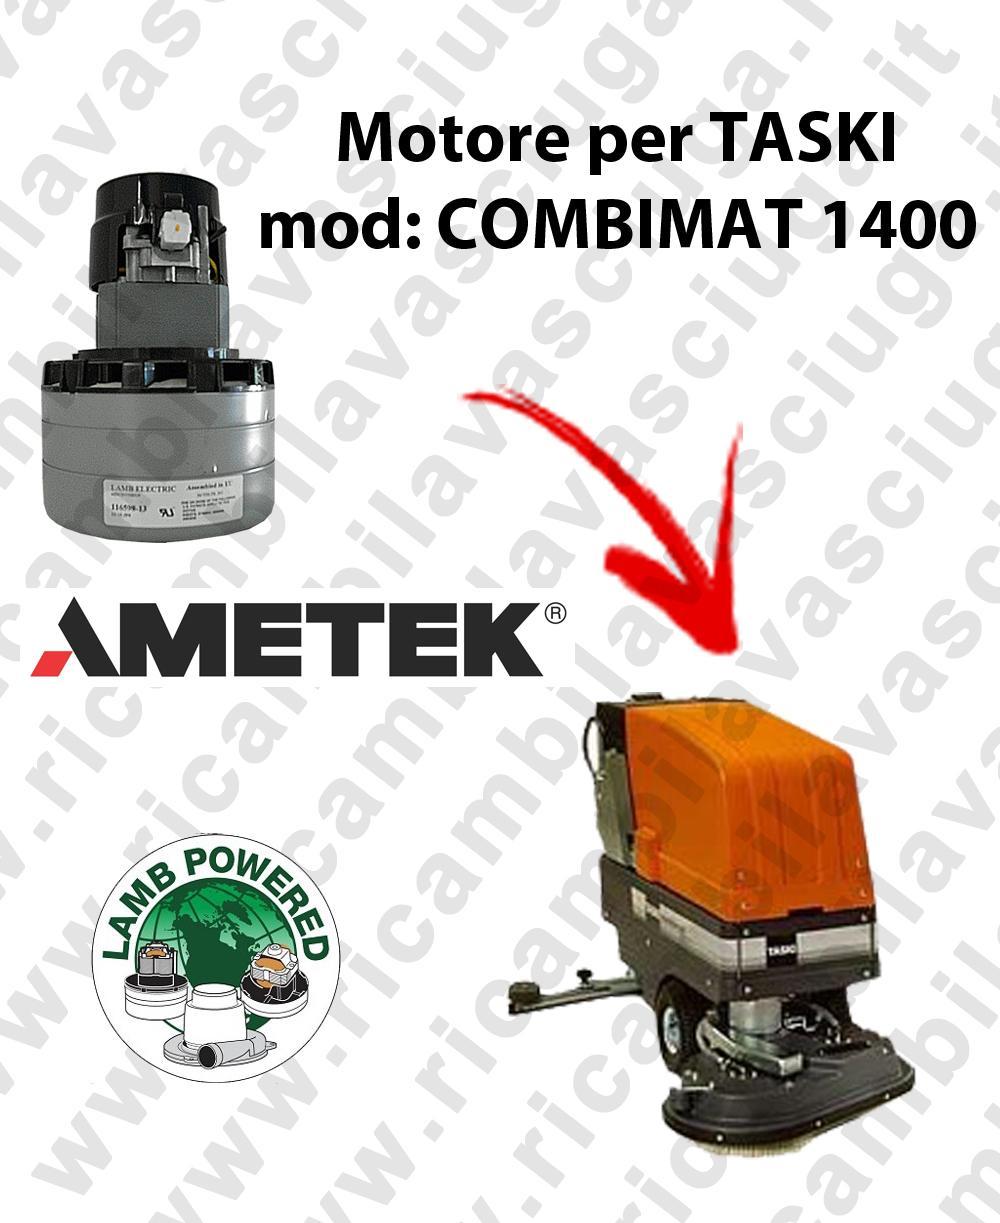 Motore LAMB AMETEK di aspirazione X lavapavimenti TASKI COMBIMAT 1400